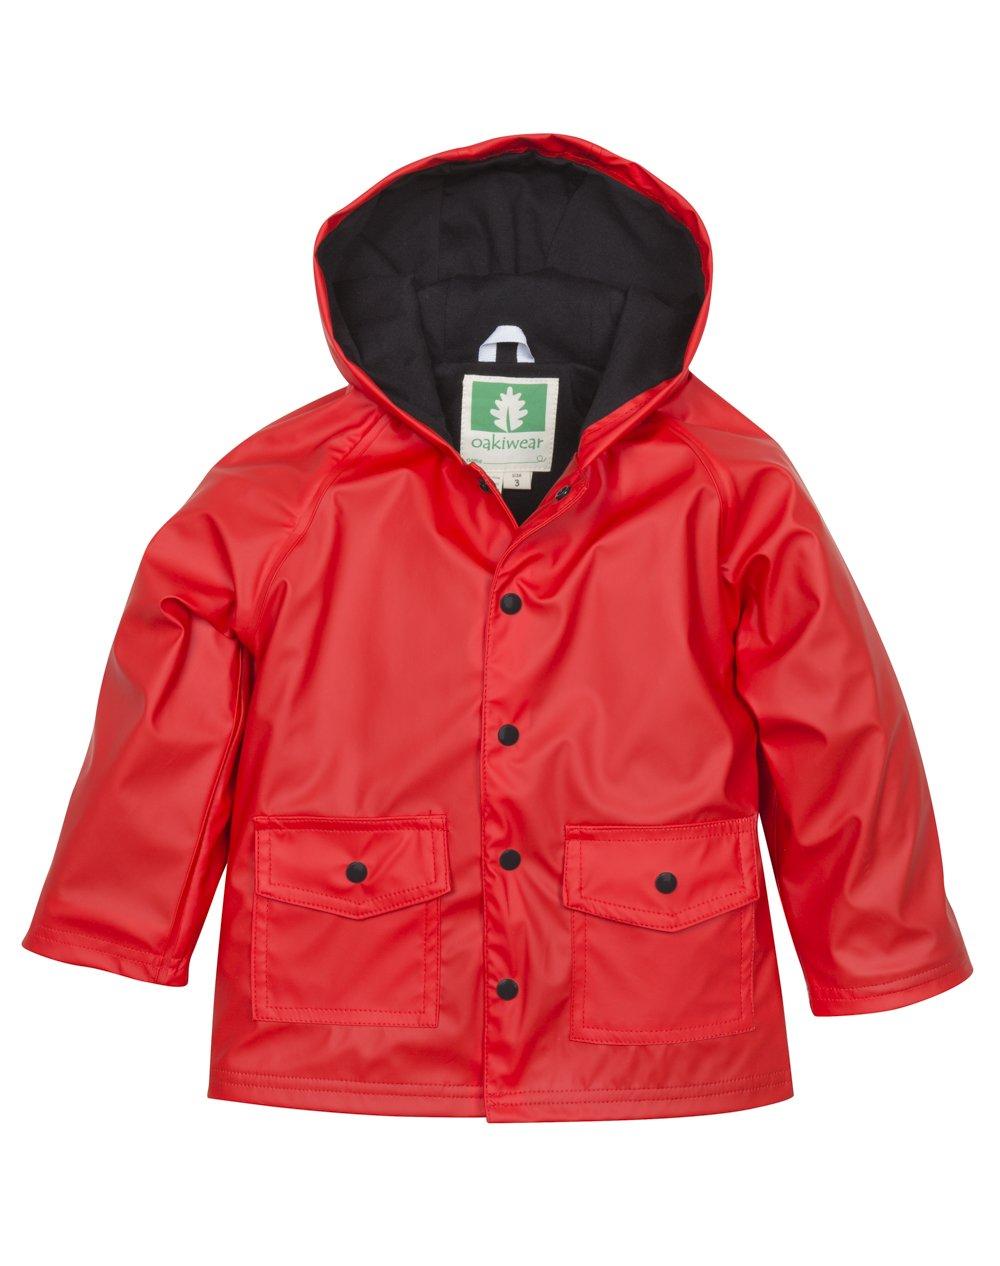 OAKI Children's Rain Jacket, Red/Black 4T Toddler